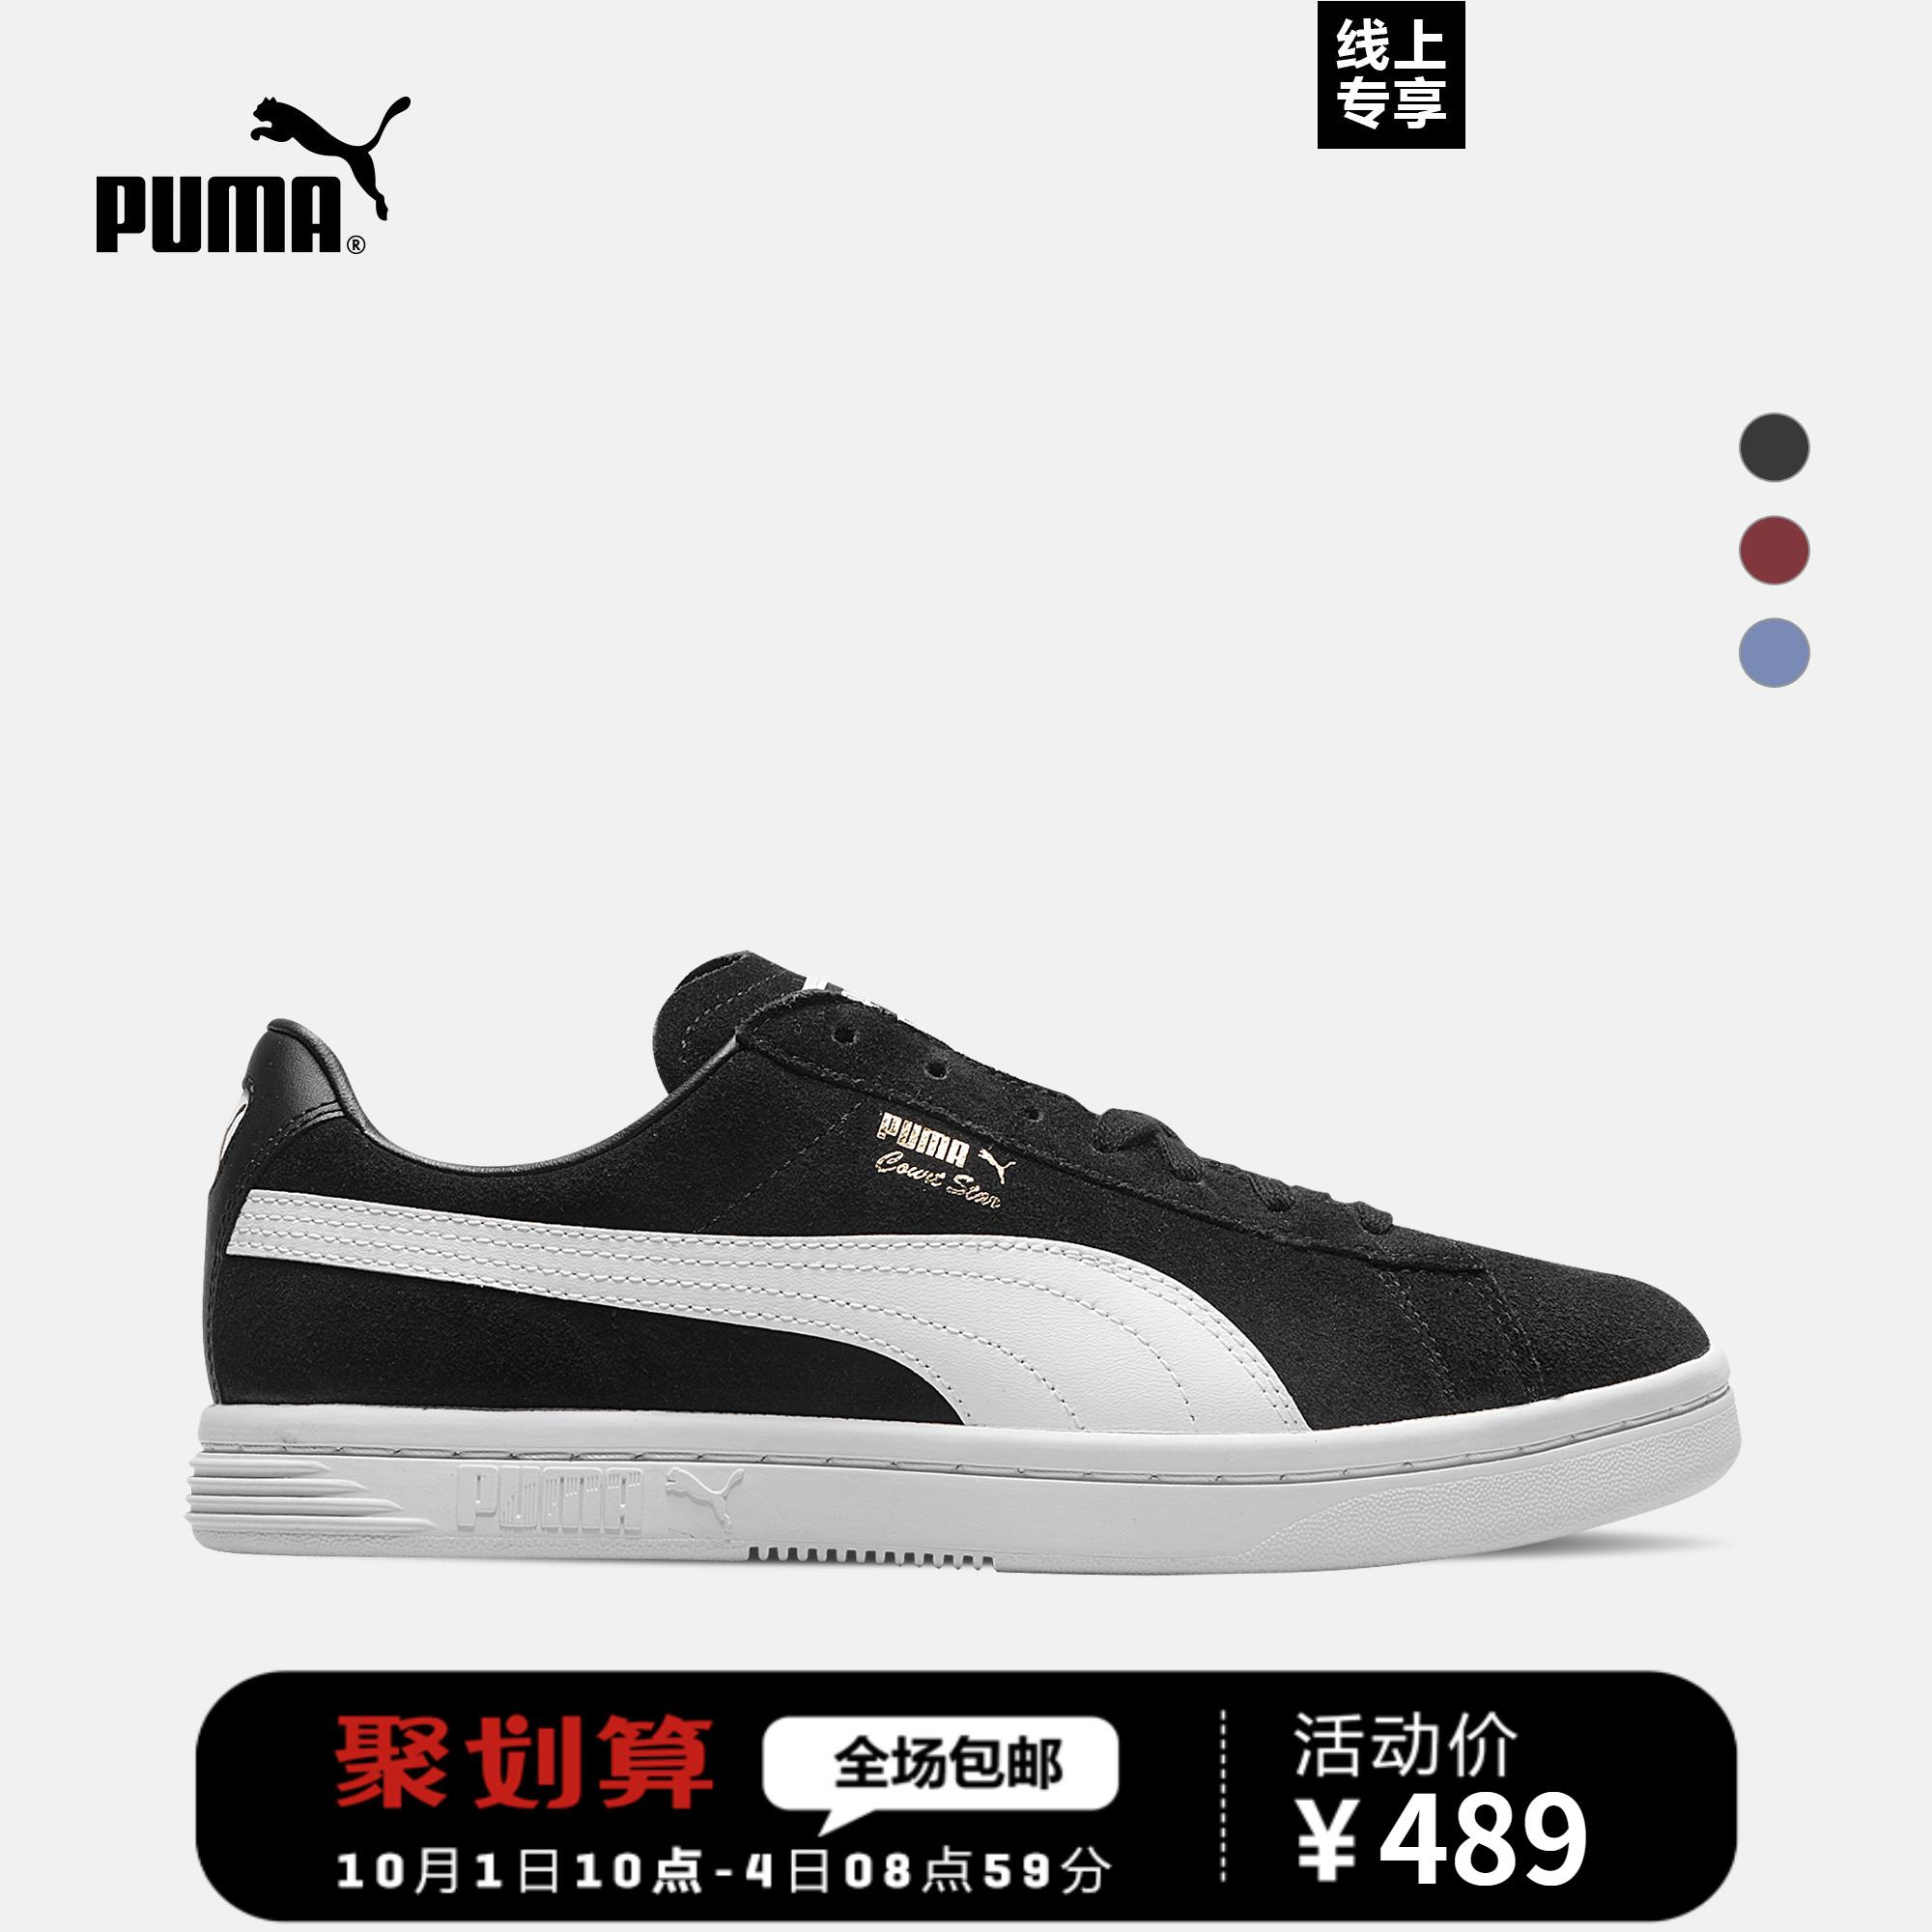 PUMA彪马官方 男女同款休闲鞋 Court Star FS 366574